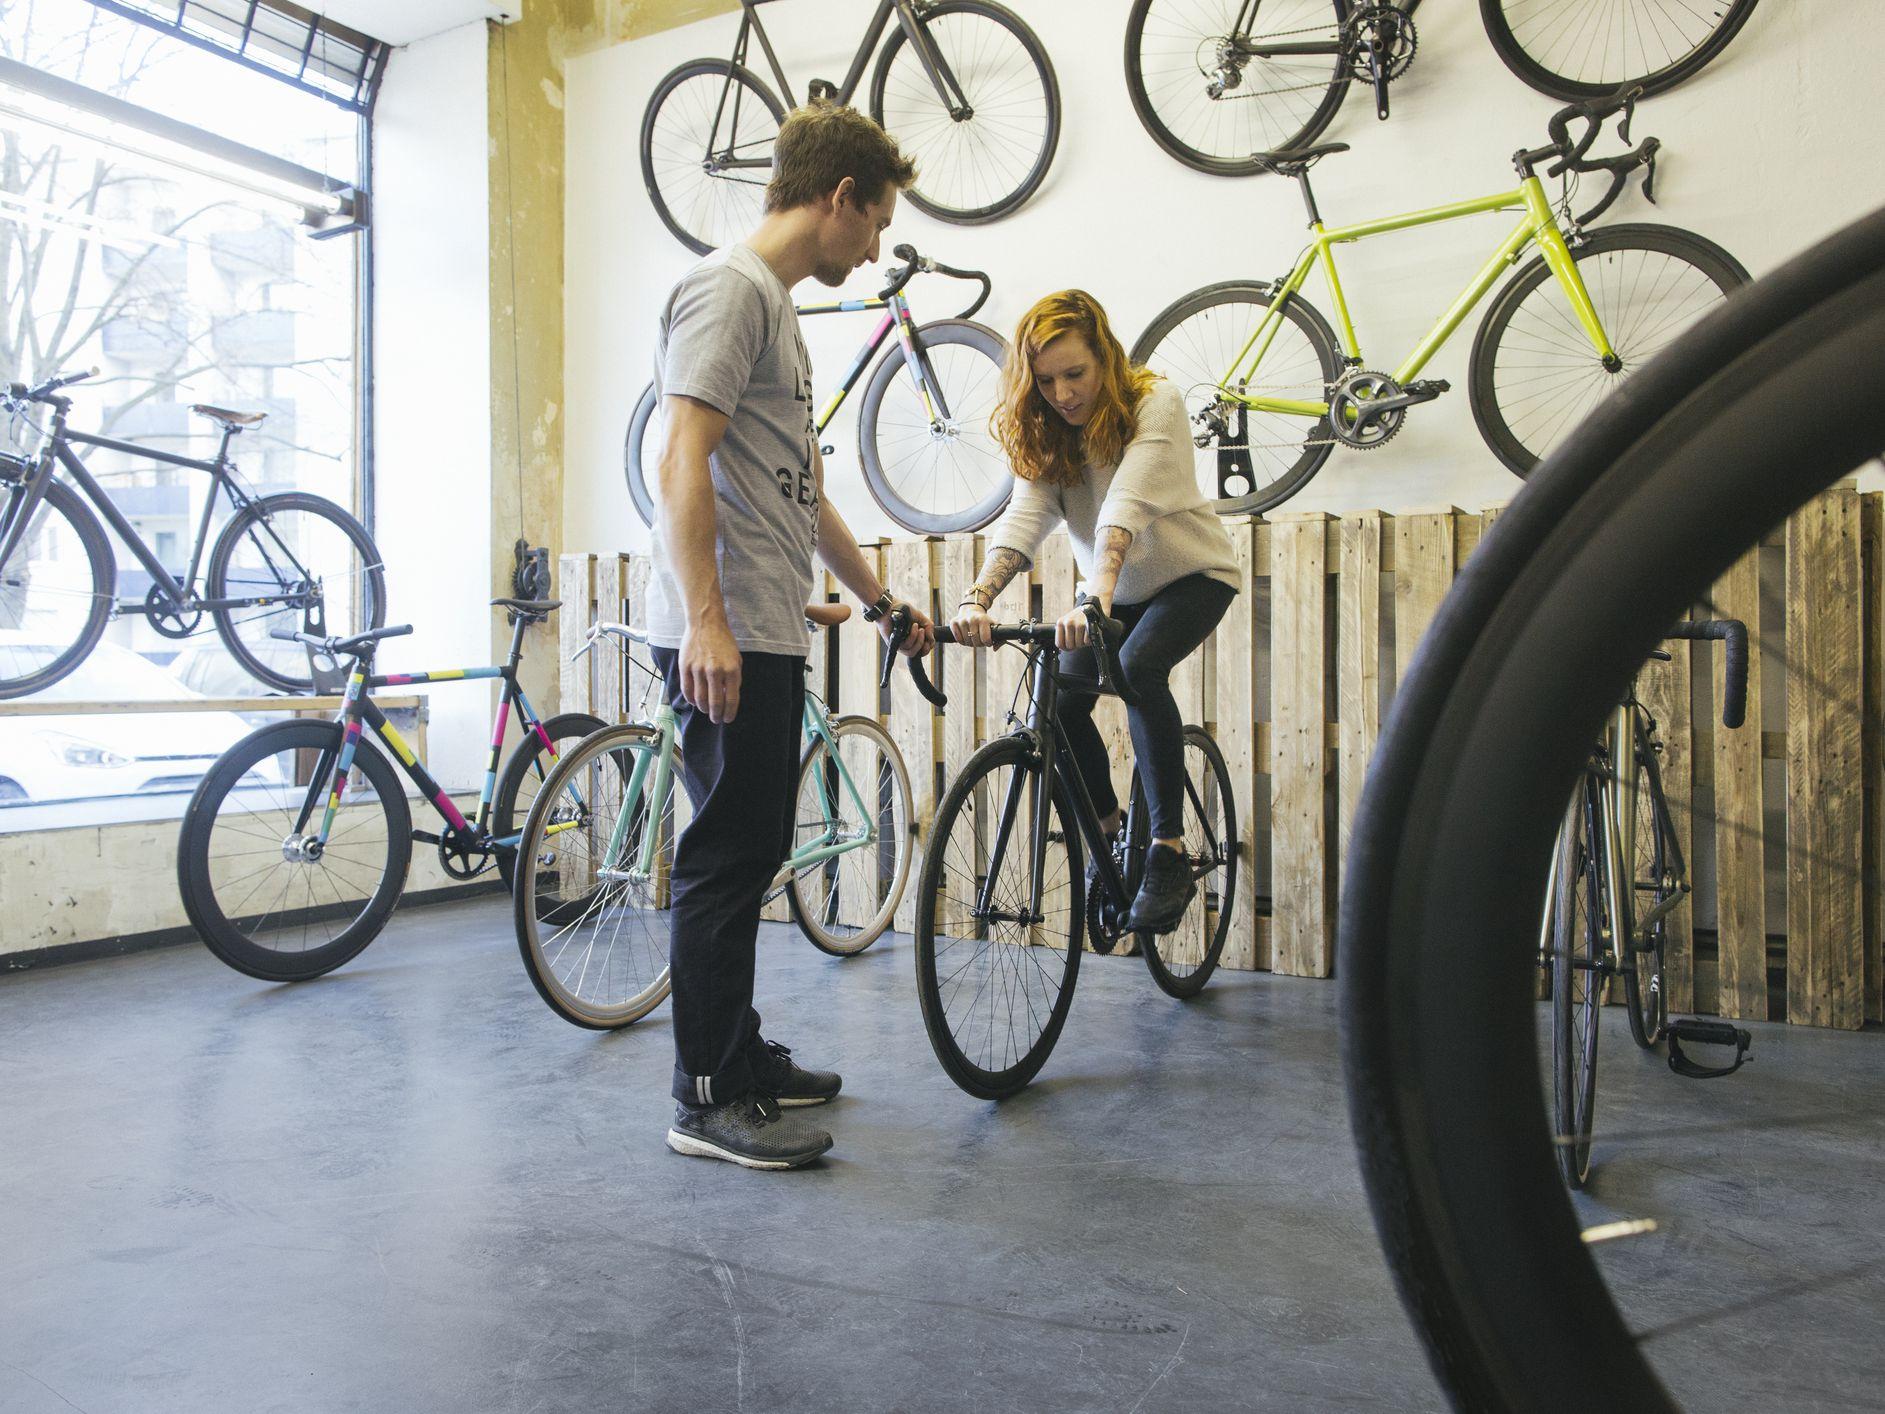 Bicycle Seat Tube Gauge Measuring Bike Cycle Seat Post Measurement Sizing Tool